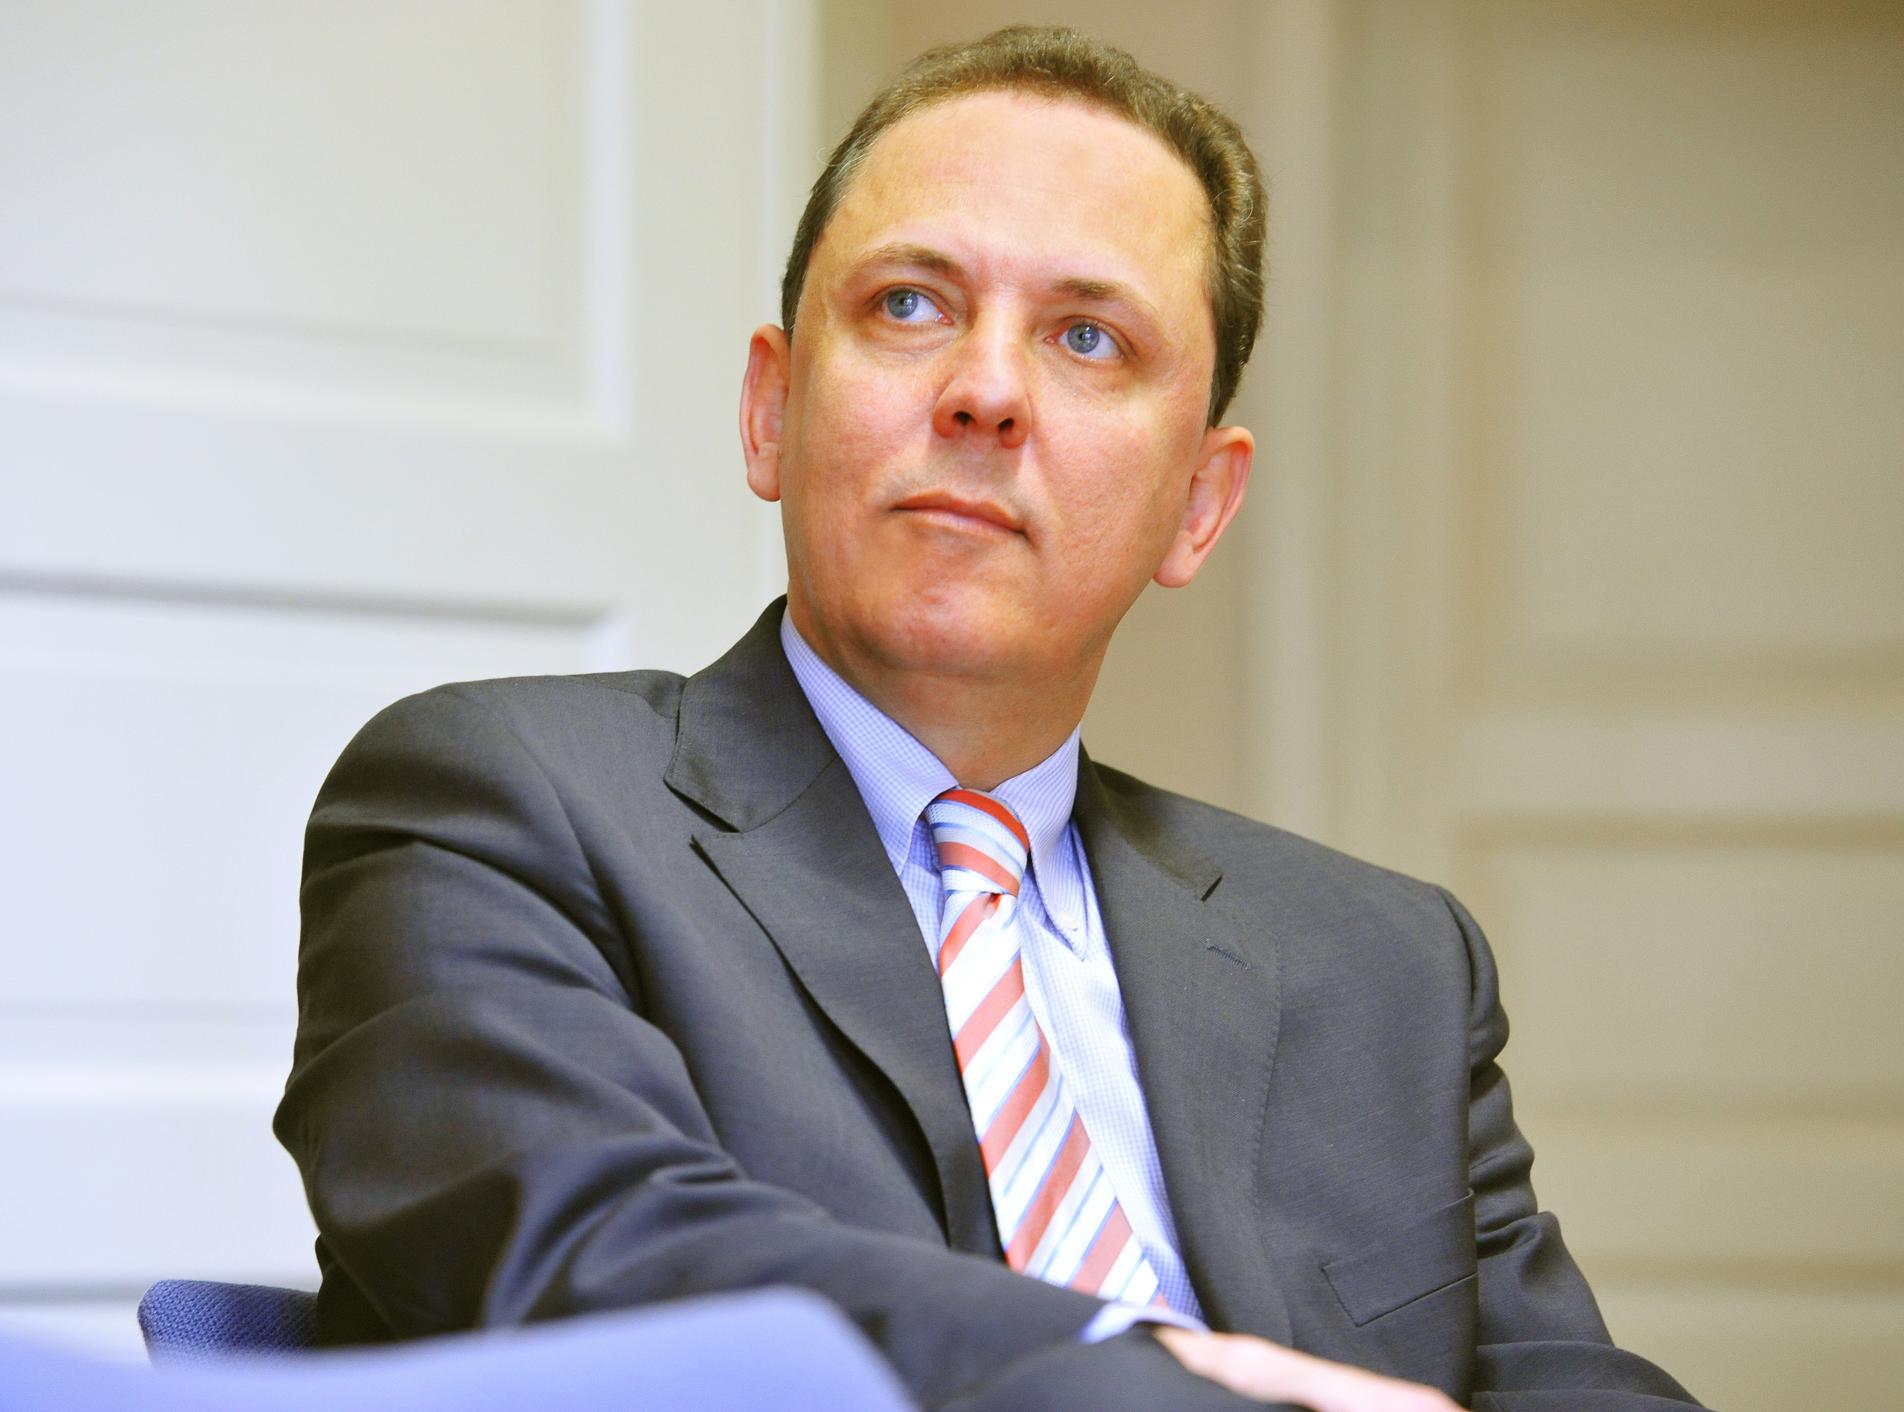 Rechtsanwalt Thorsten Springstub Schuldnerberatung Erfurt